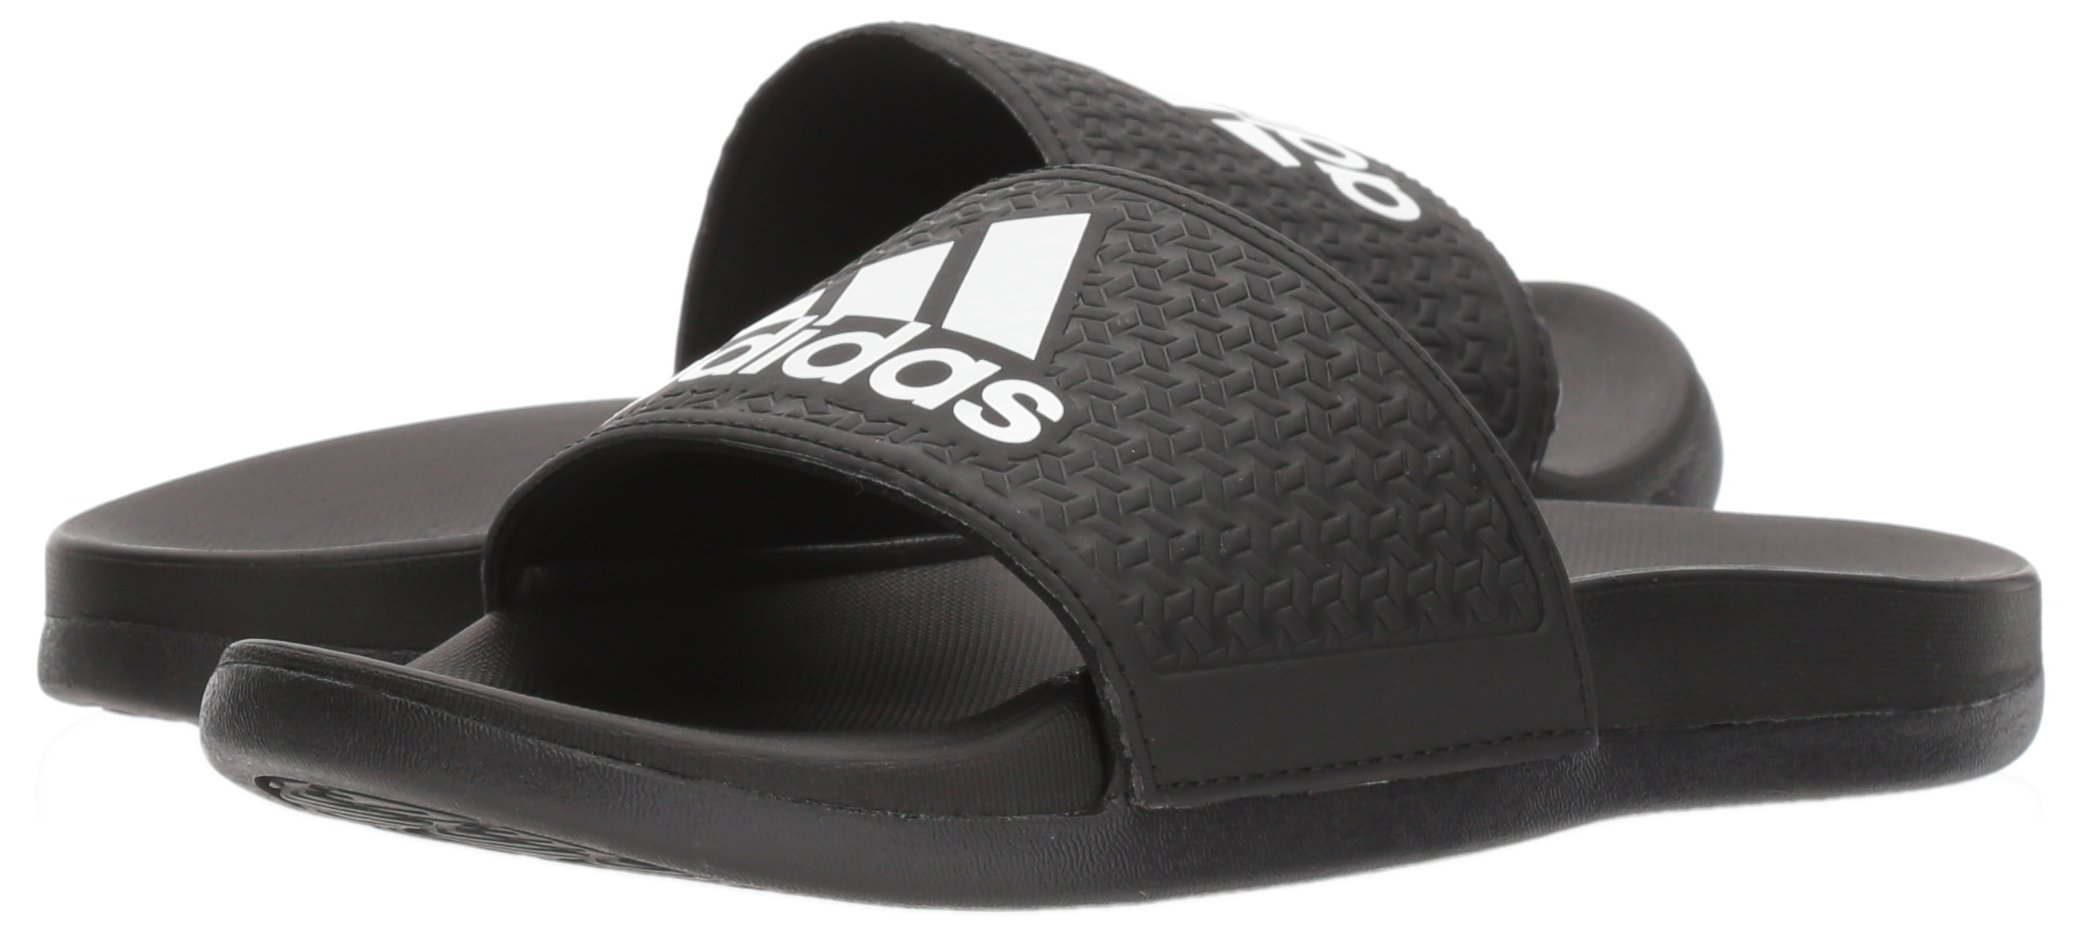 adidas Unisex-Kids Adilette Clf+ K Sandal,core black,White, core black,6 M US Big Kid by adidas (Image #6)